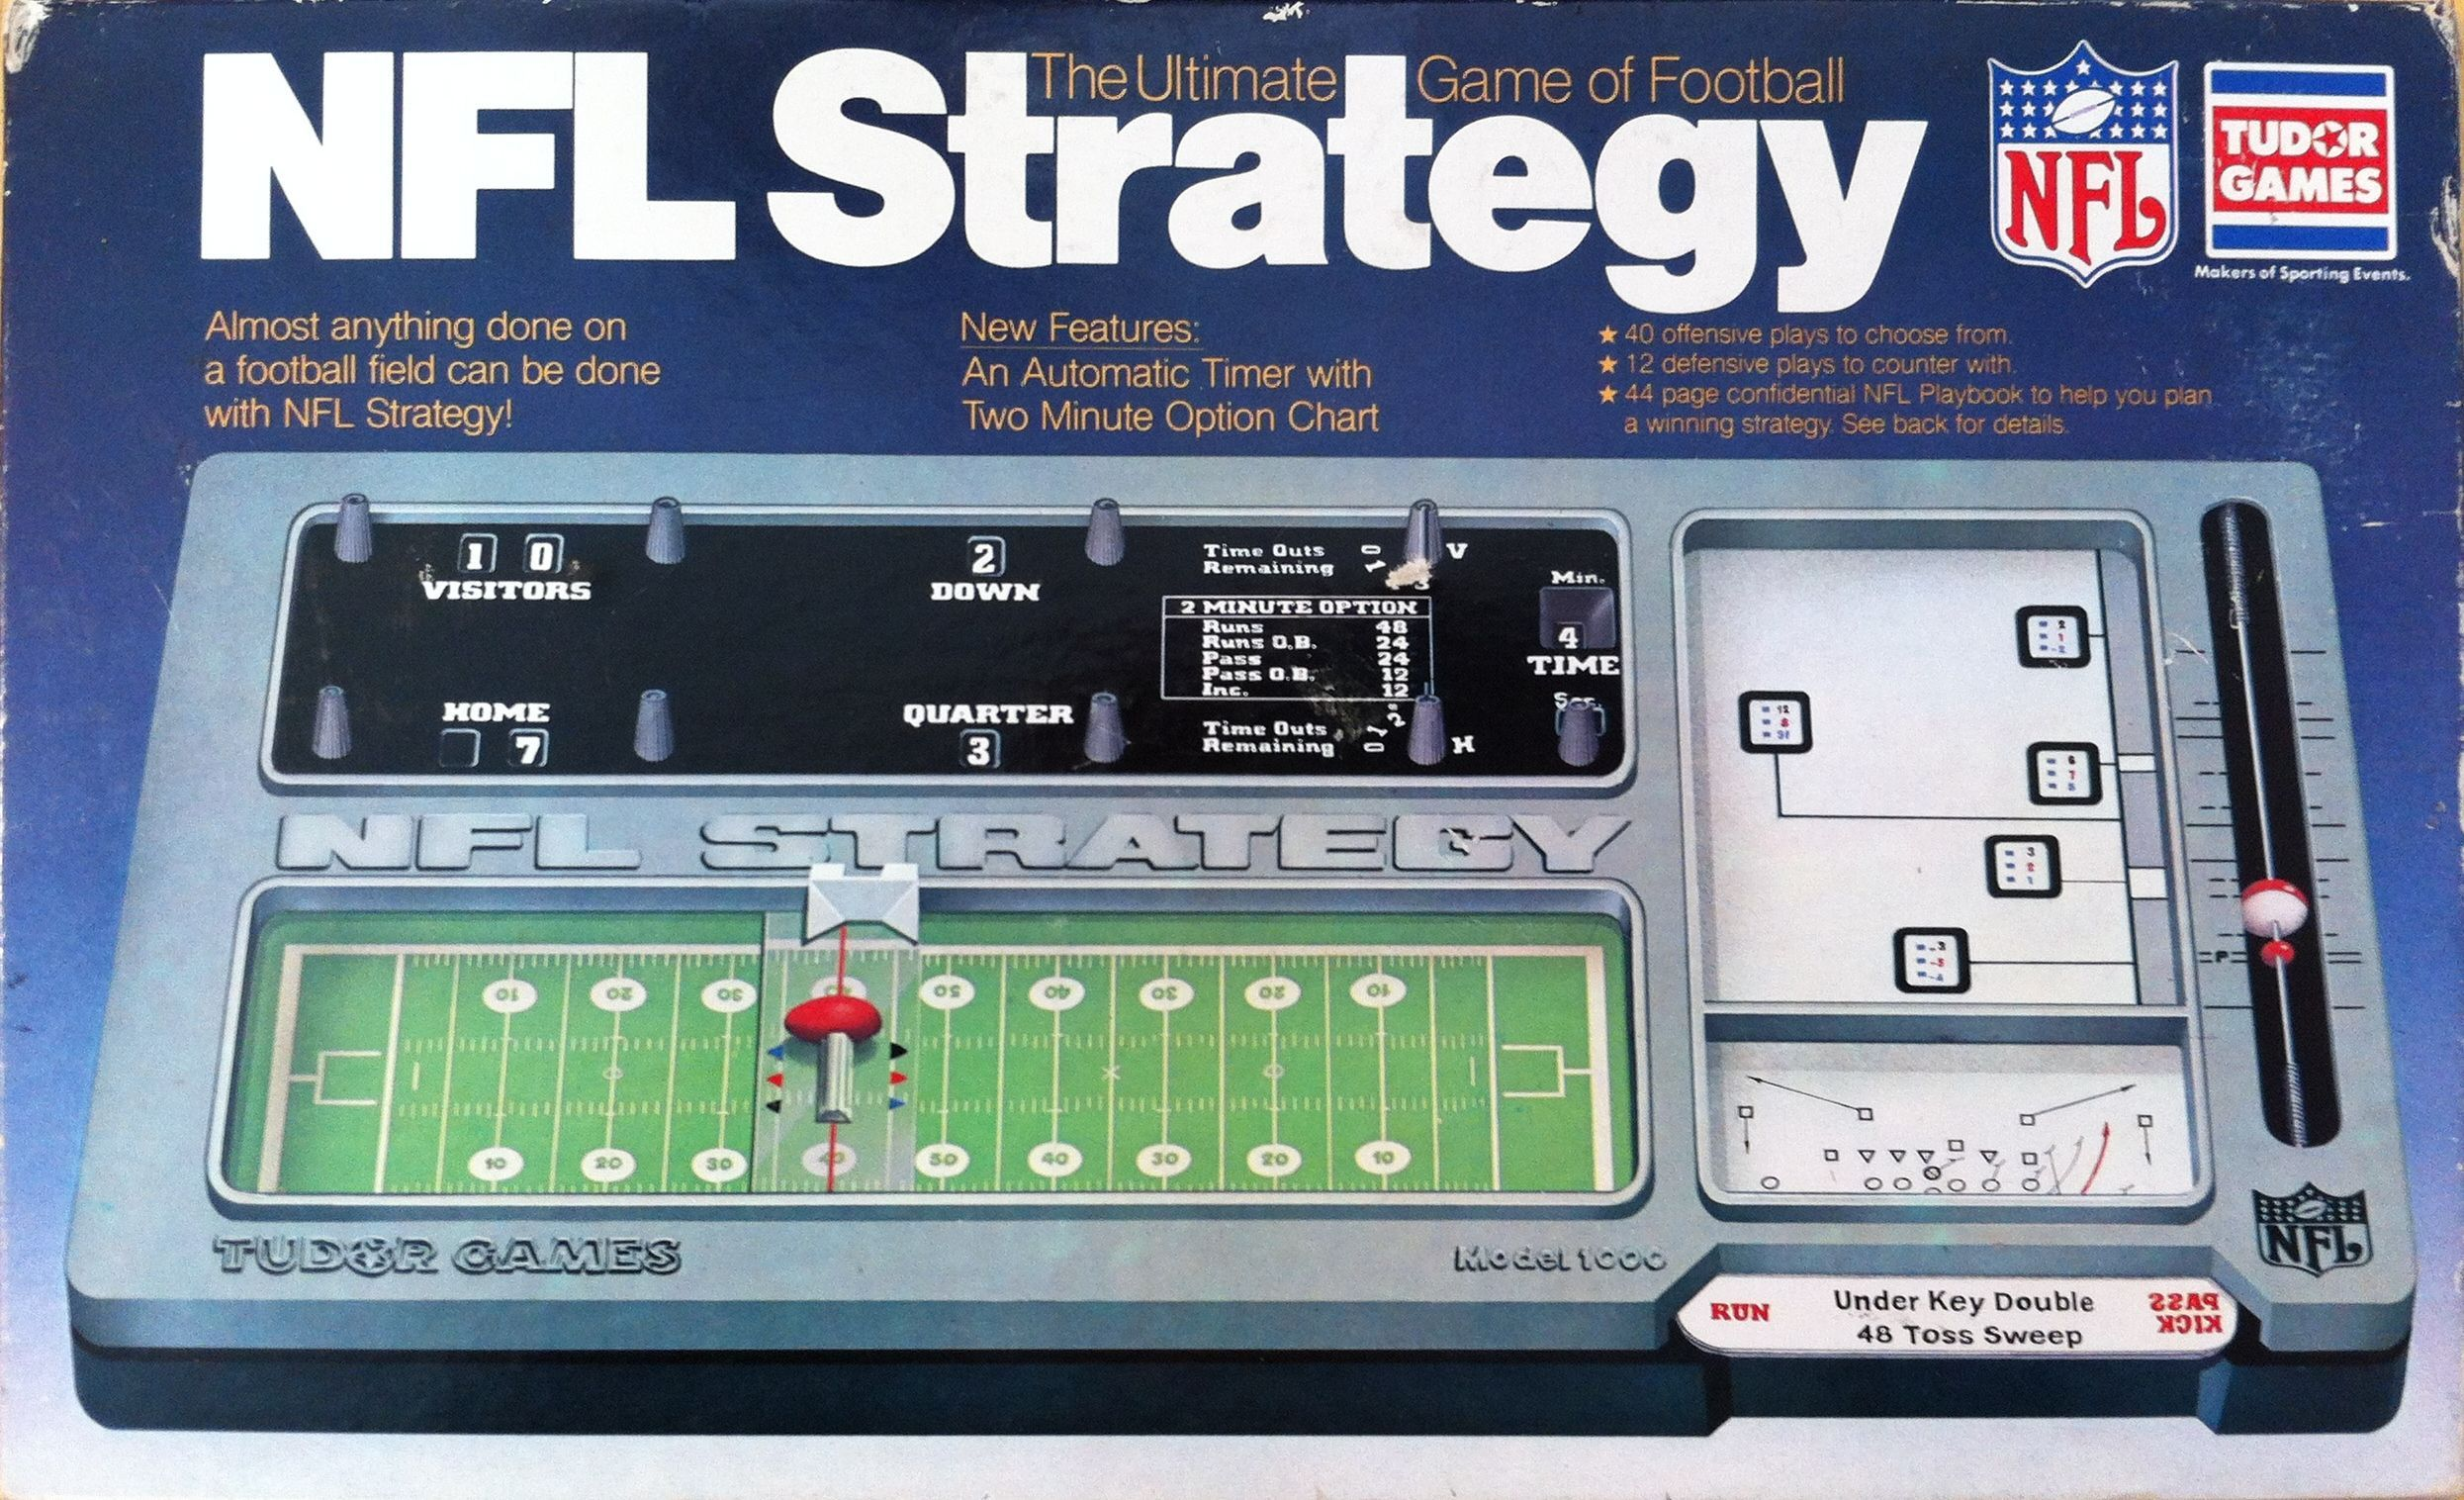 NFL Strategy